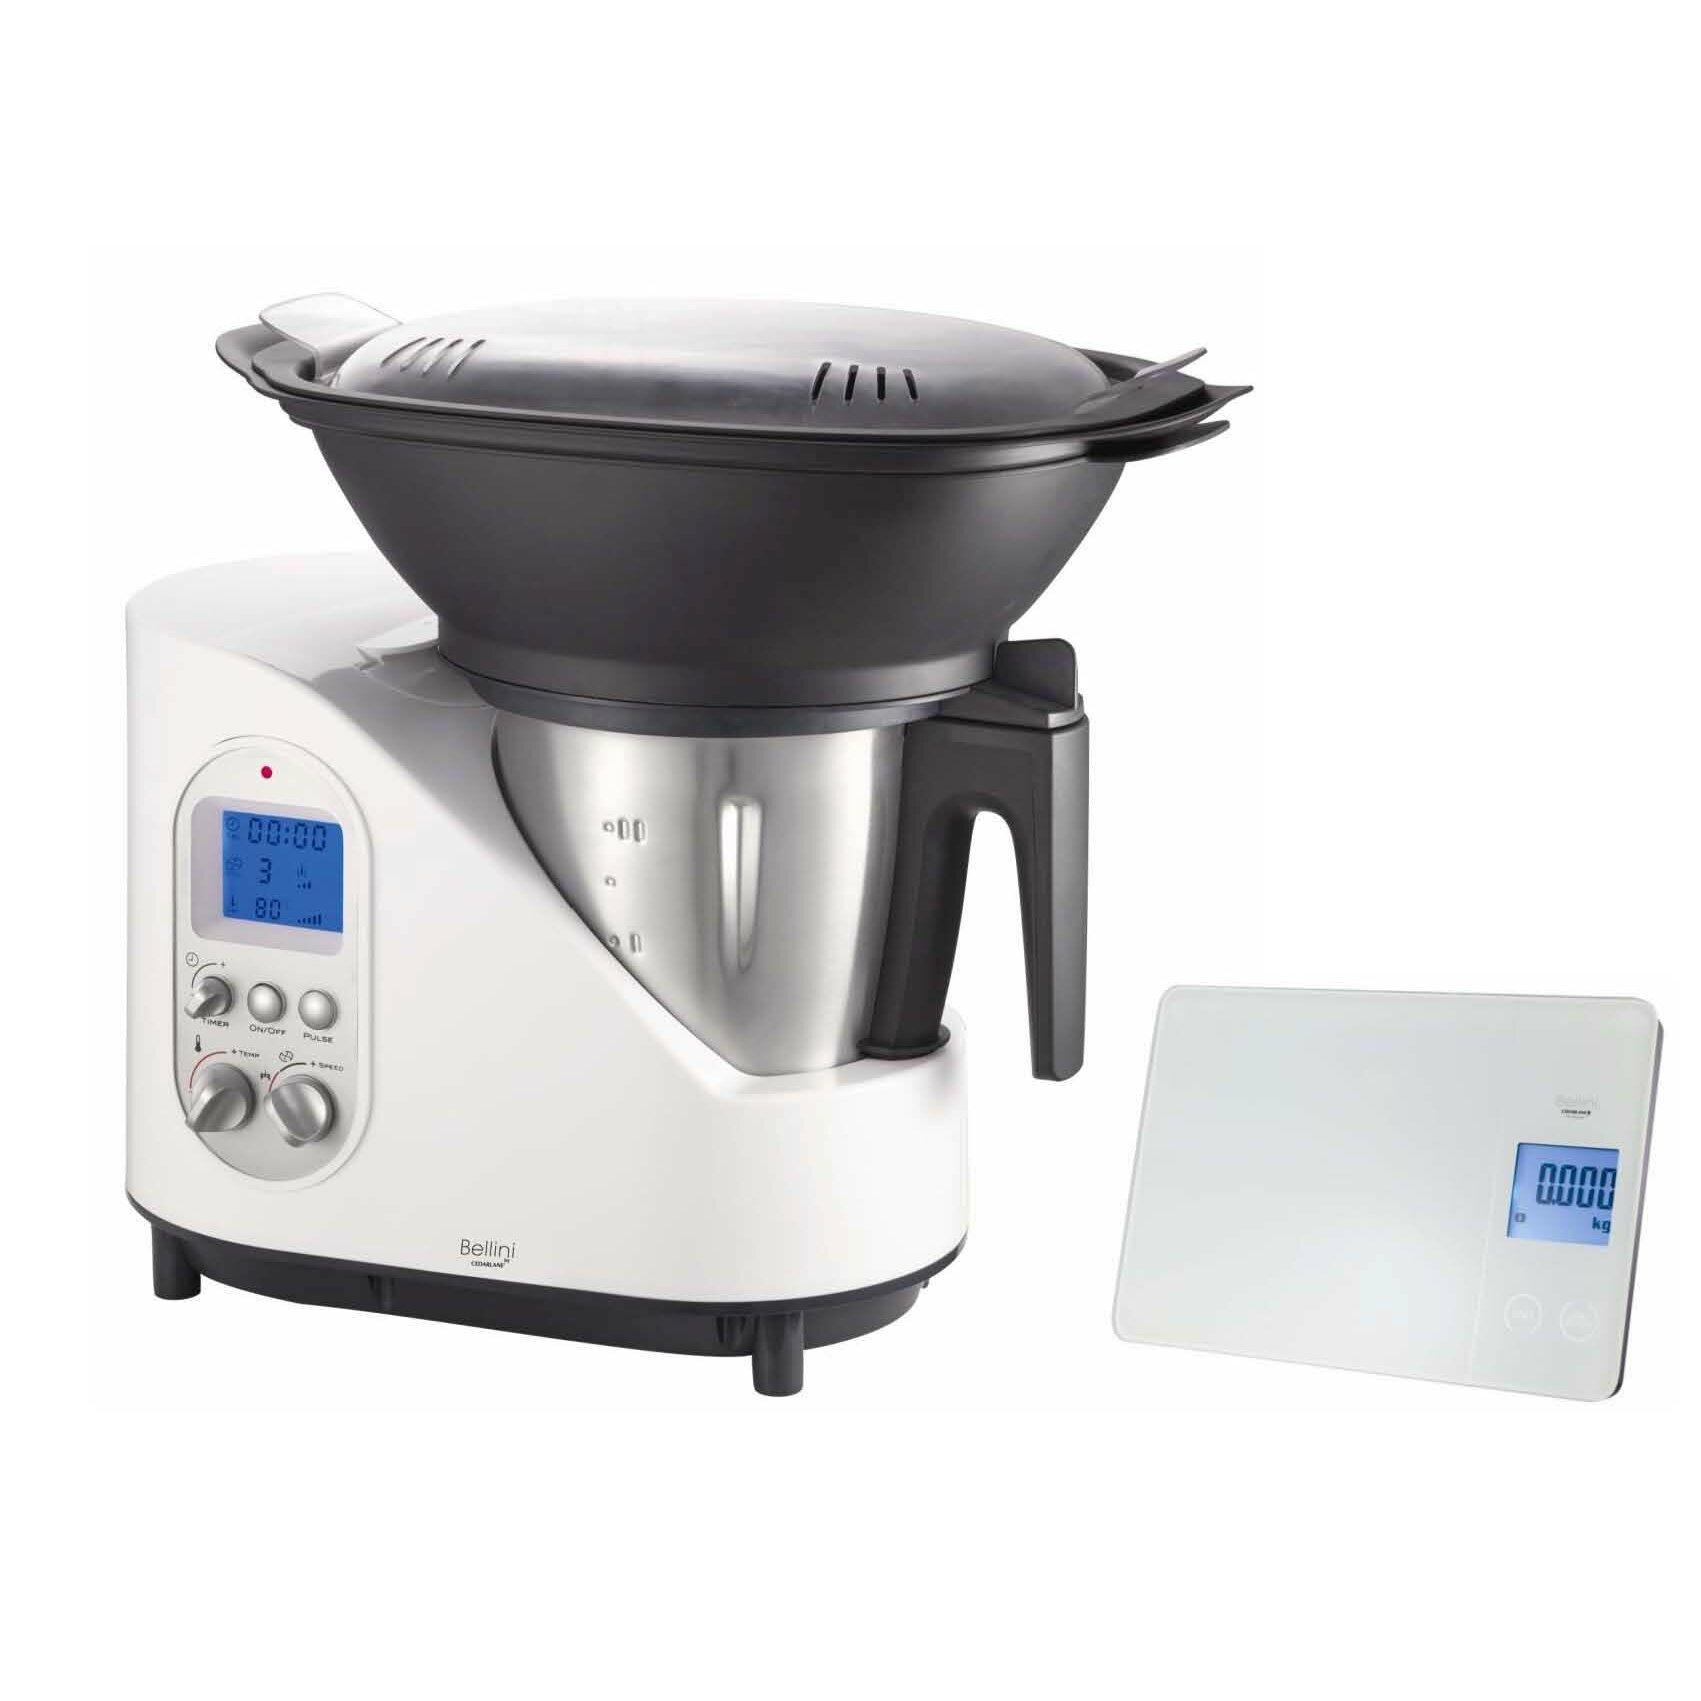 Bellini By Cedarlane Kitchen Master & Reviews